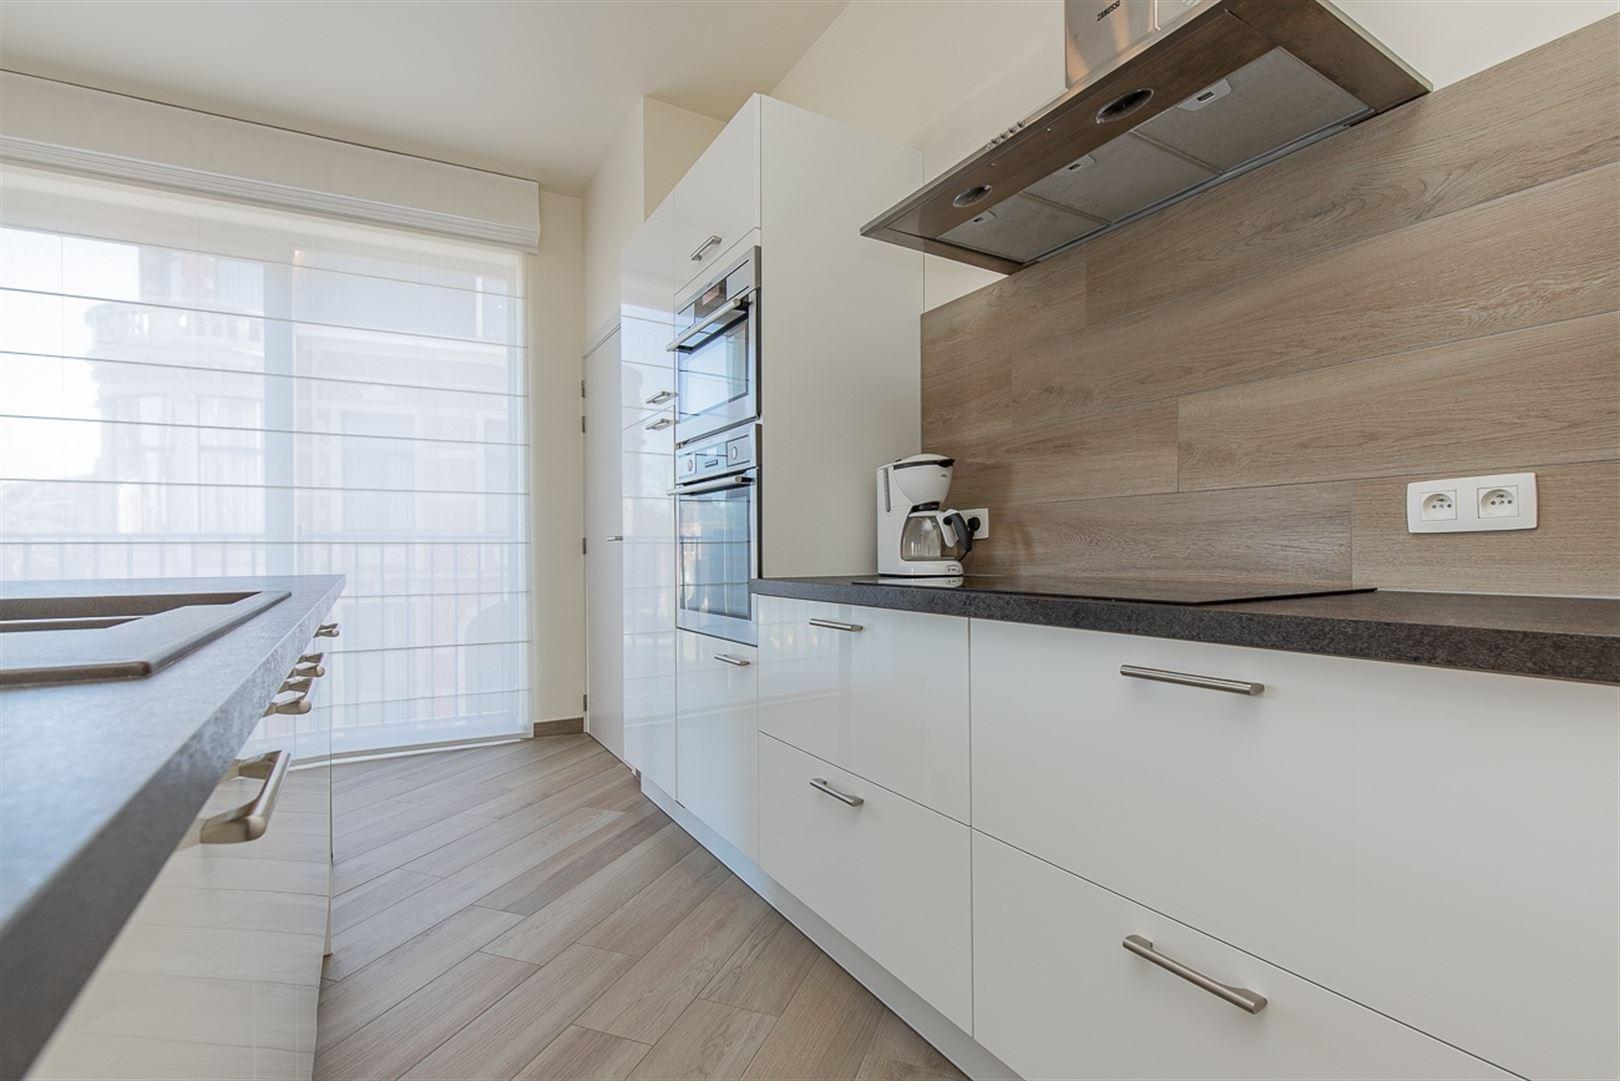 Foto 5 : Appartement te 9200 DENDERMONDE (België) - Prijs € 299.000